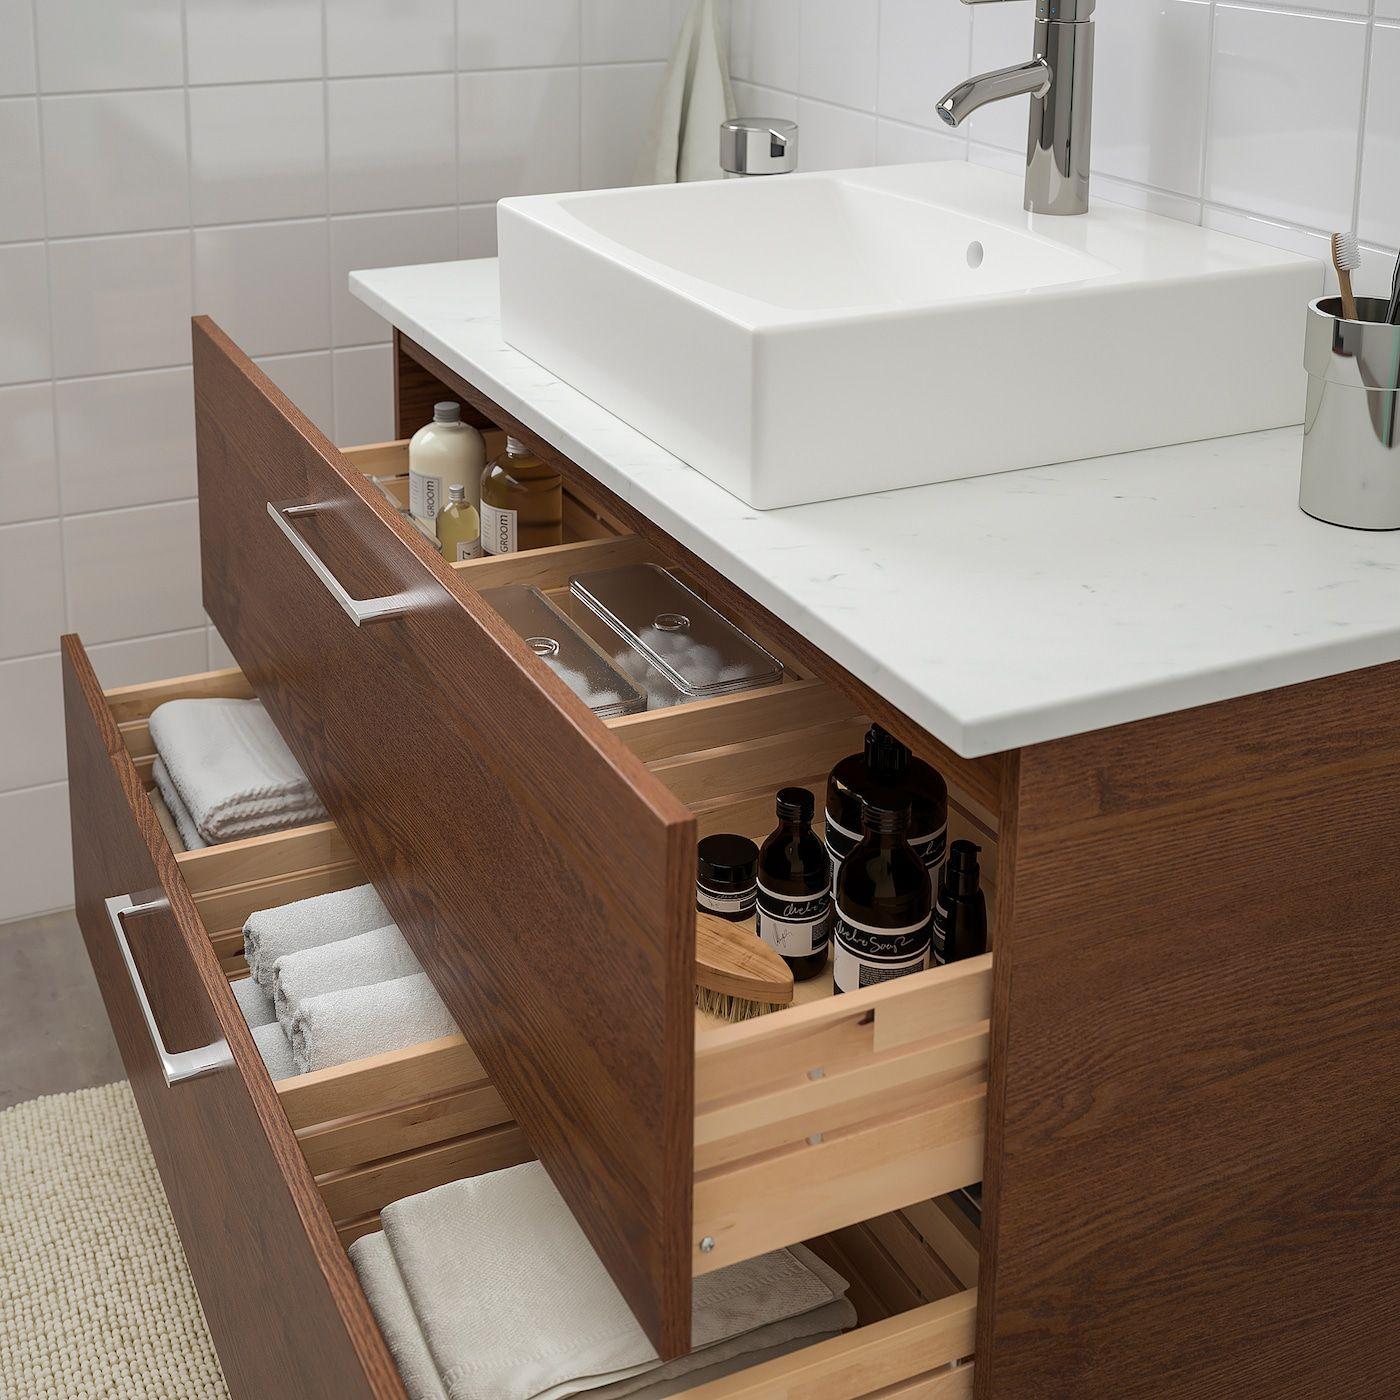 Godmorgon Tolken Tornviken Bathroom Vanity Brown Stained Ash Effect Marble Effect Dalskar Faucet 40 1 8x19 1 4x28 3 8 102x49x72 Cm Mobilier Salle De Bain Meuble Lavabo Et Idee Salle De Bain